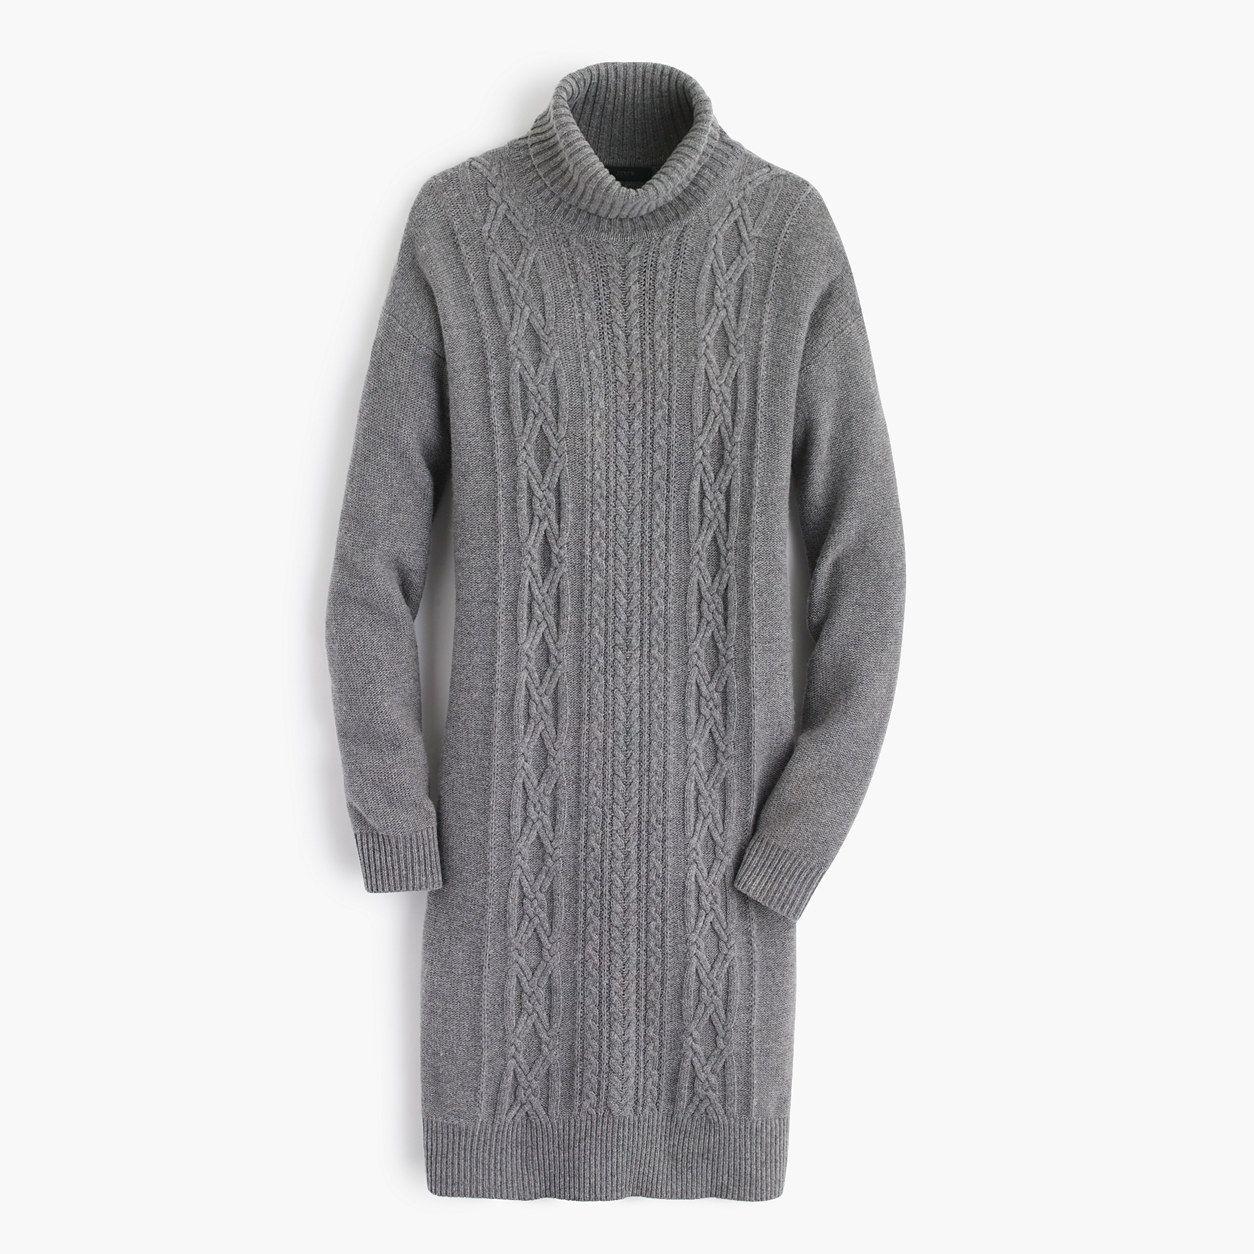 ef2179b59ec J.Crew Womens Cable Turtleneck Sweater-Dress (Size L)